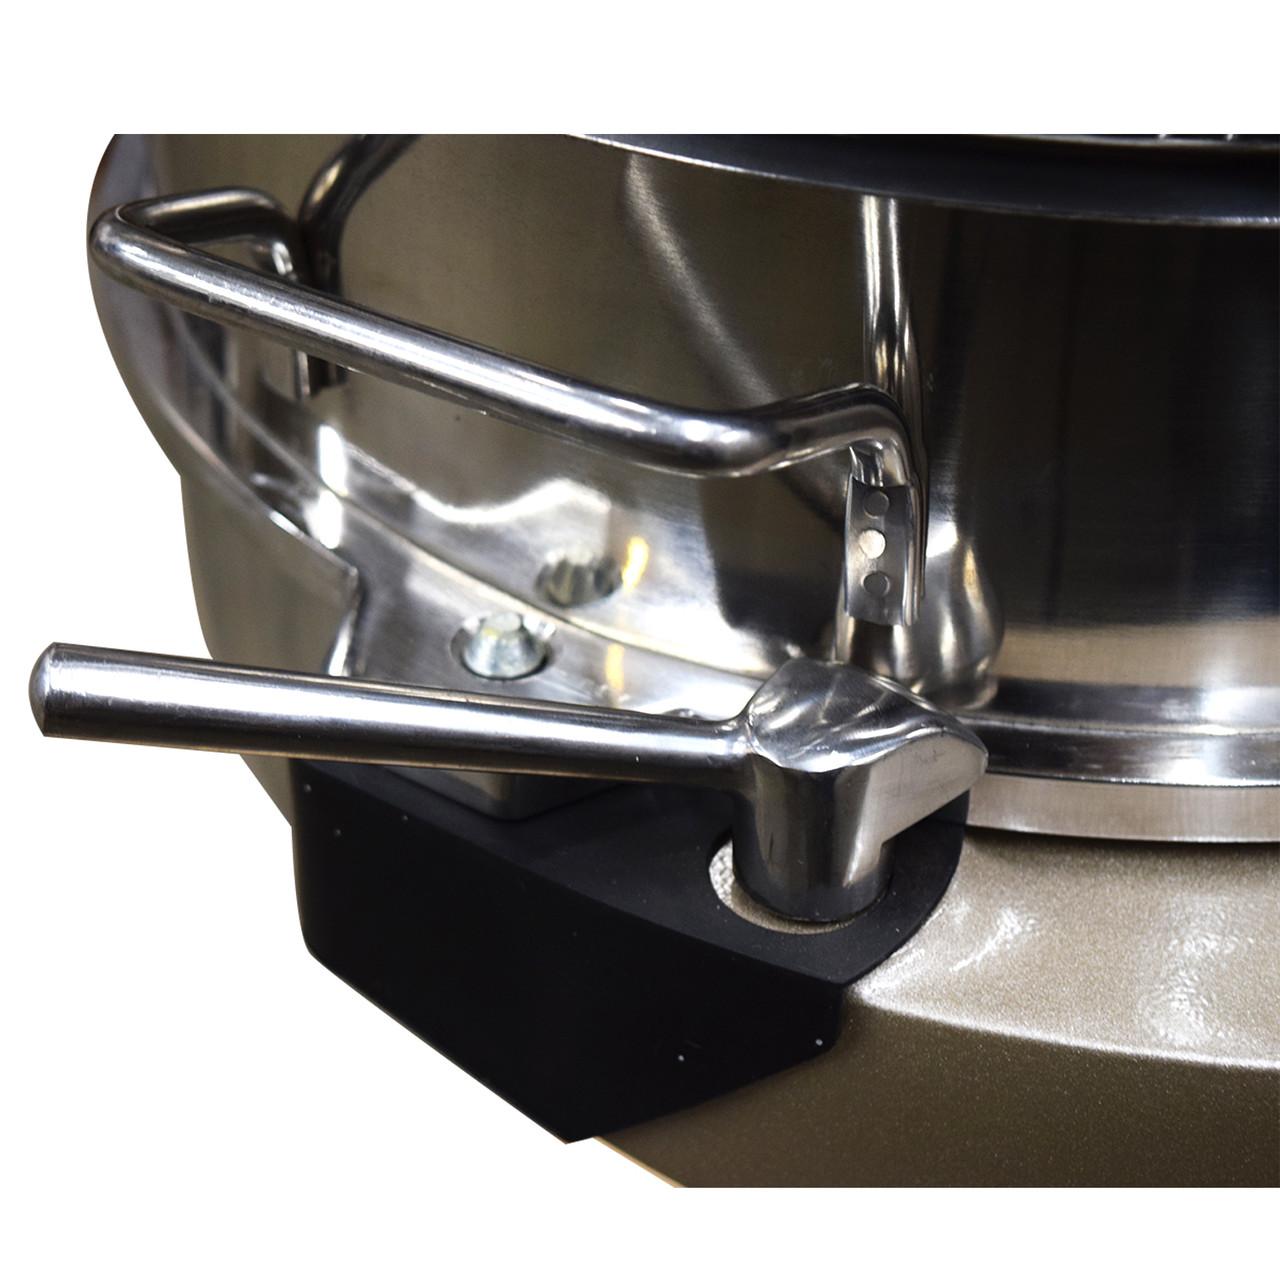 AE-30GA 30 Quart Commercial Planetary Mixer Mixer Bowl Arm